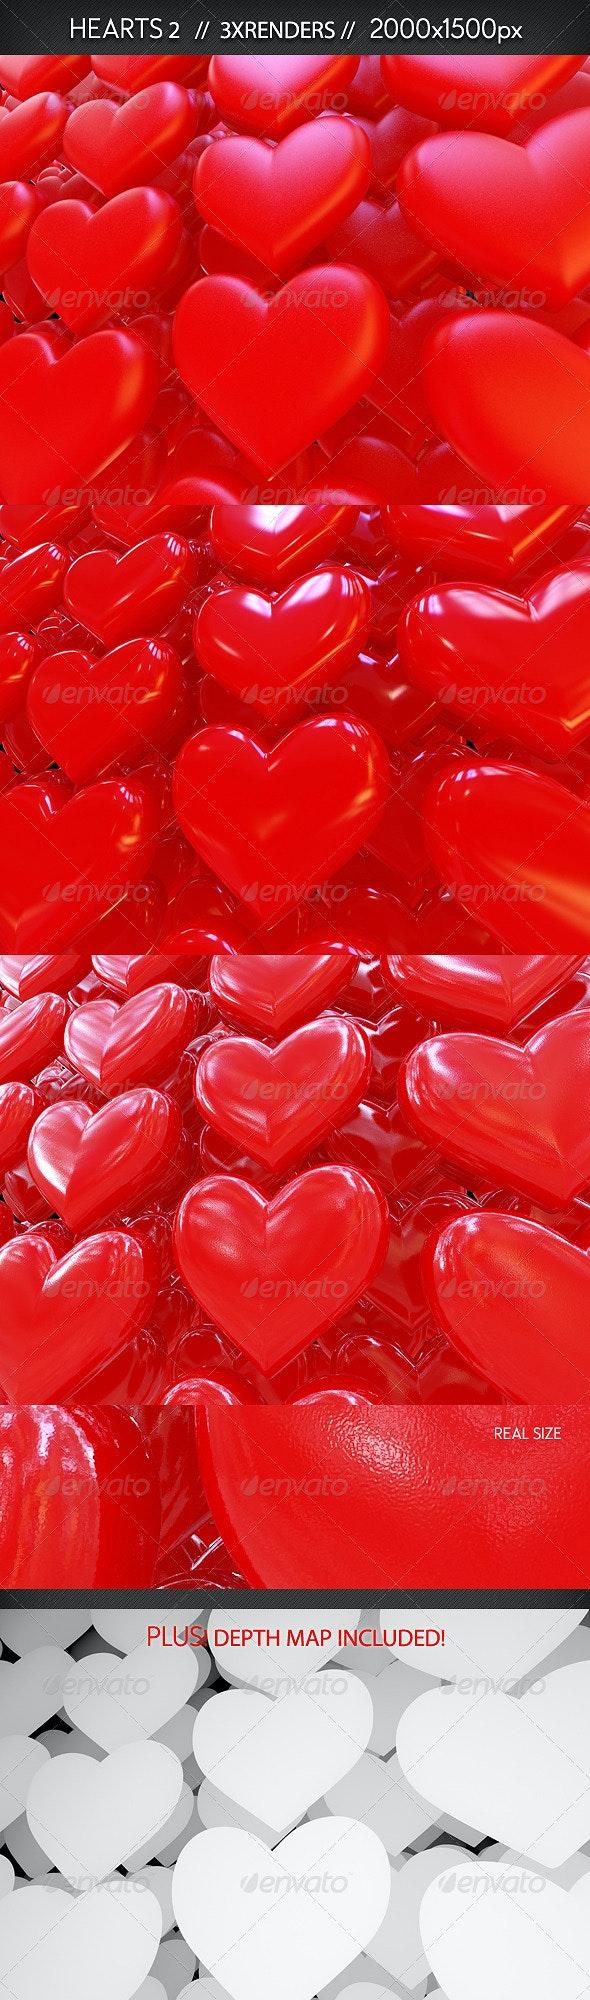 3D Hearts - Miscellaneous 3D Renders